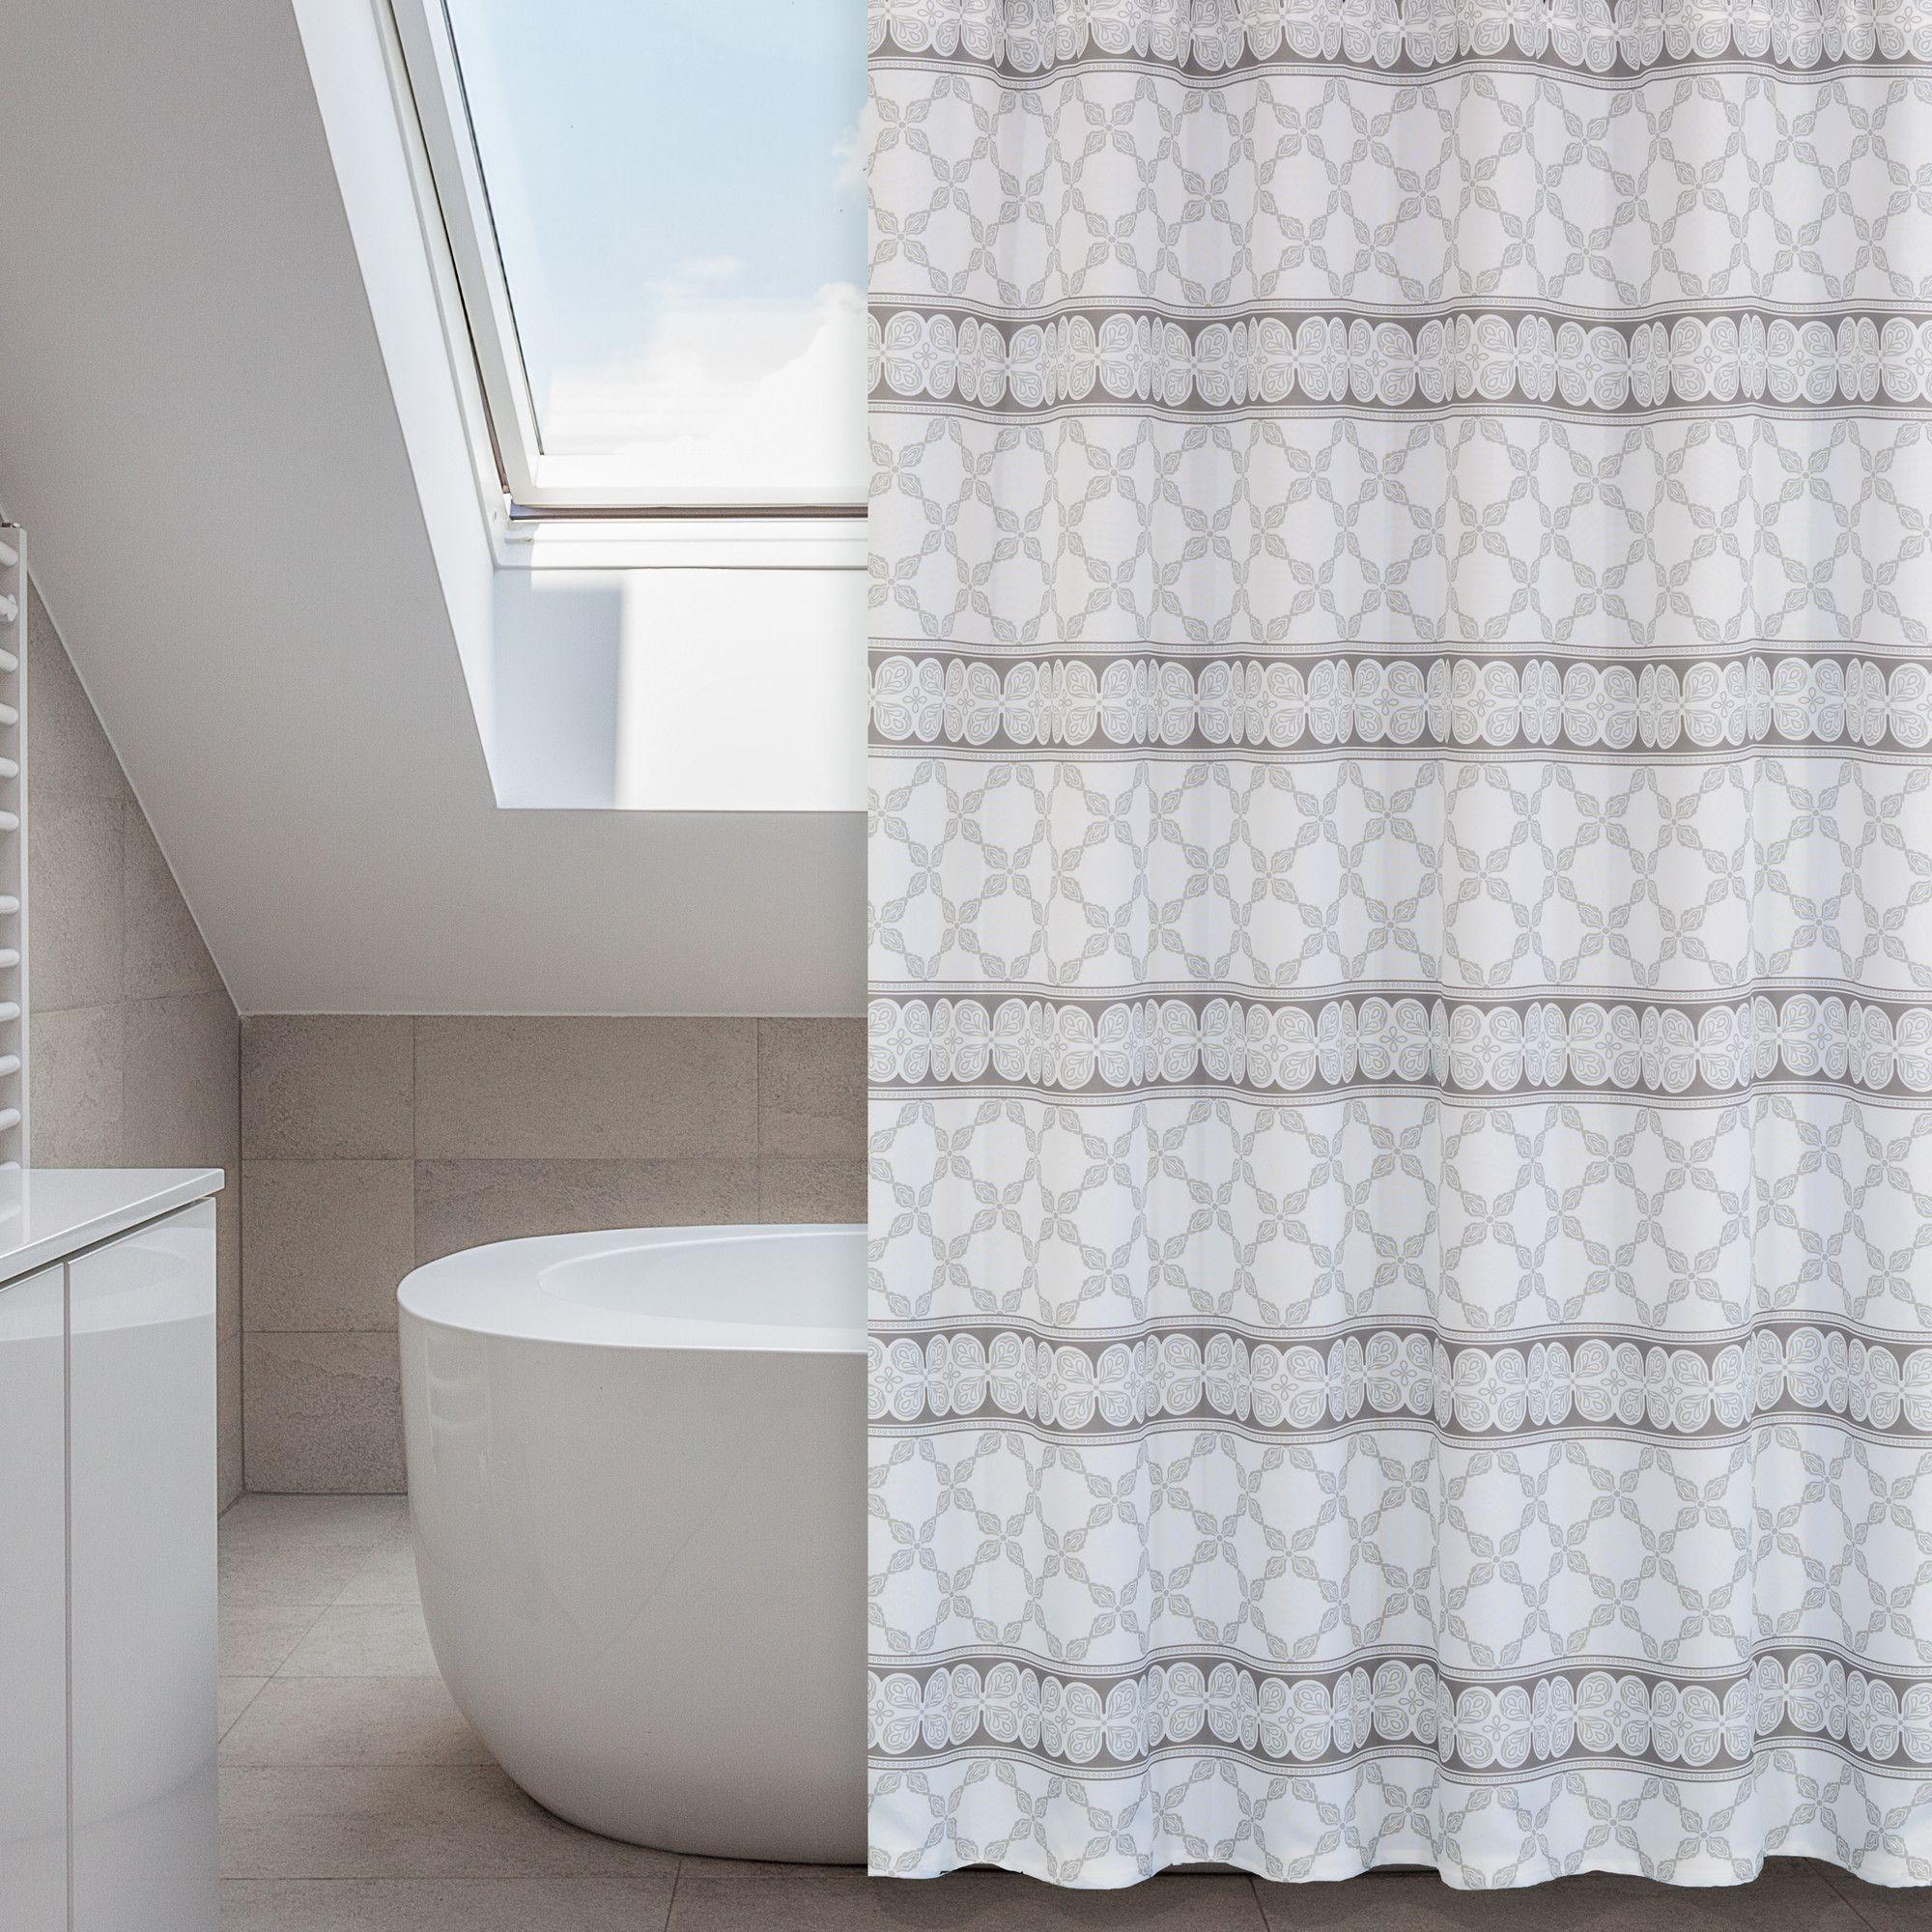 Vogue Shower Curtain Set | Products | Pinterest | Shower curtain ...